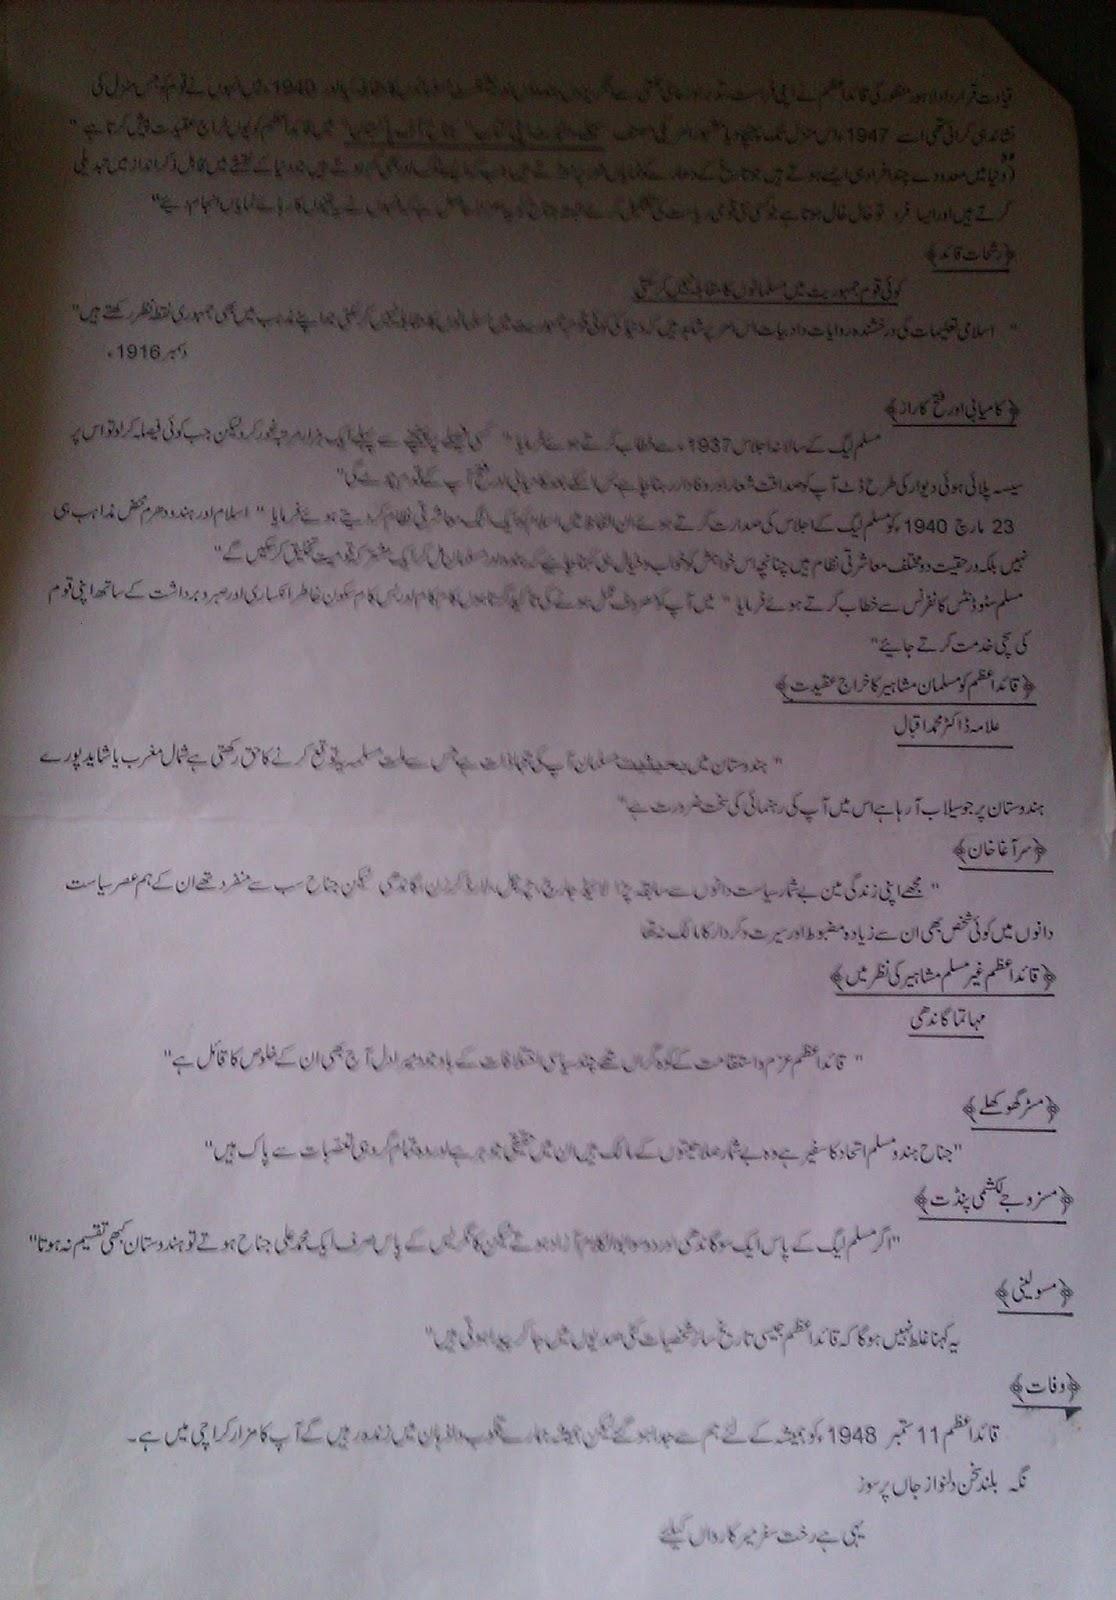 Quaid E Azam Essay In Urdu Written : Quaid e azam essay in urdu written